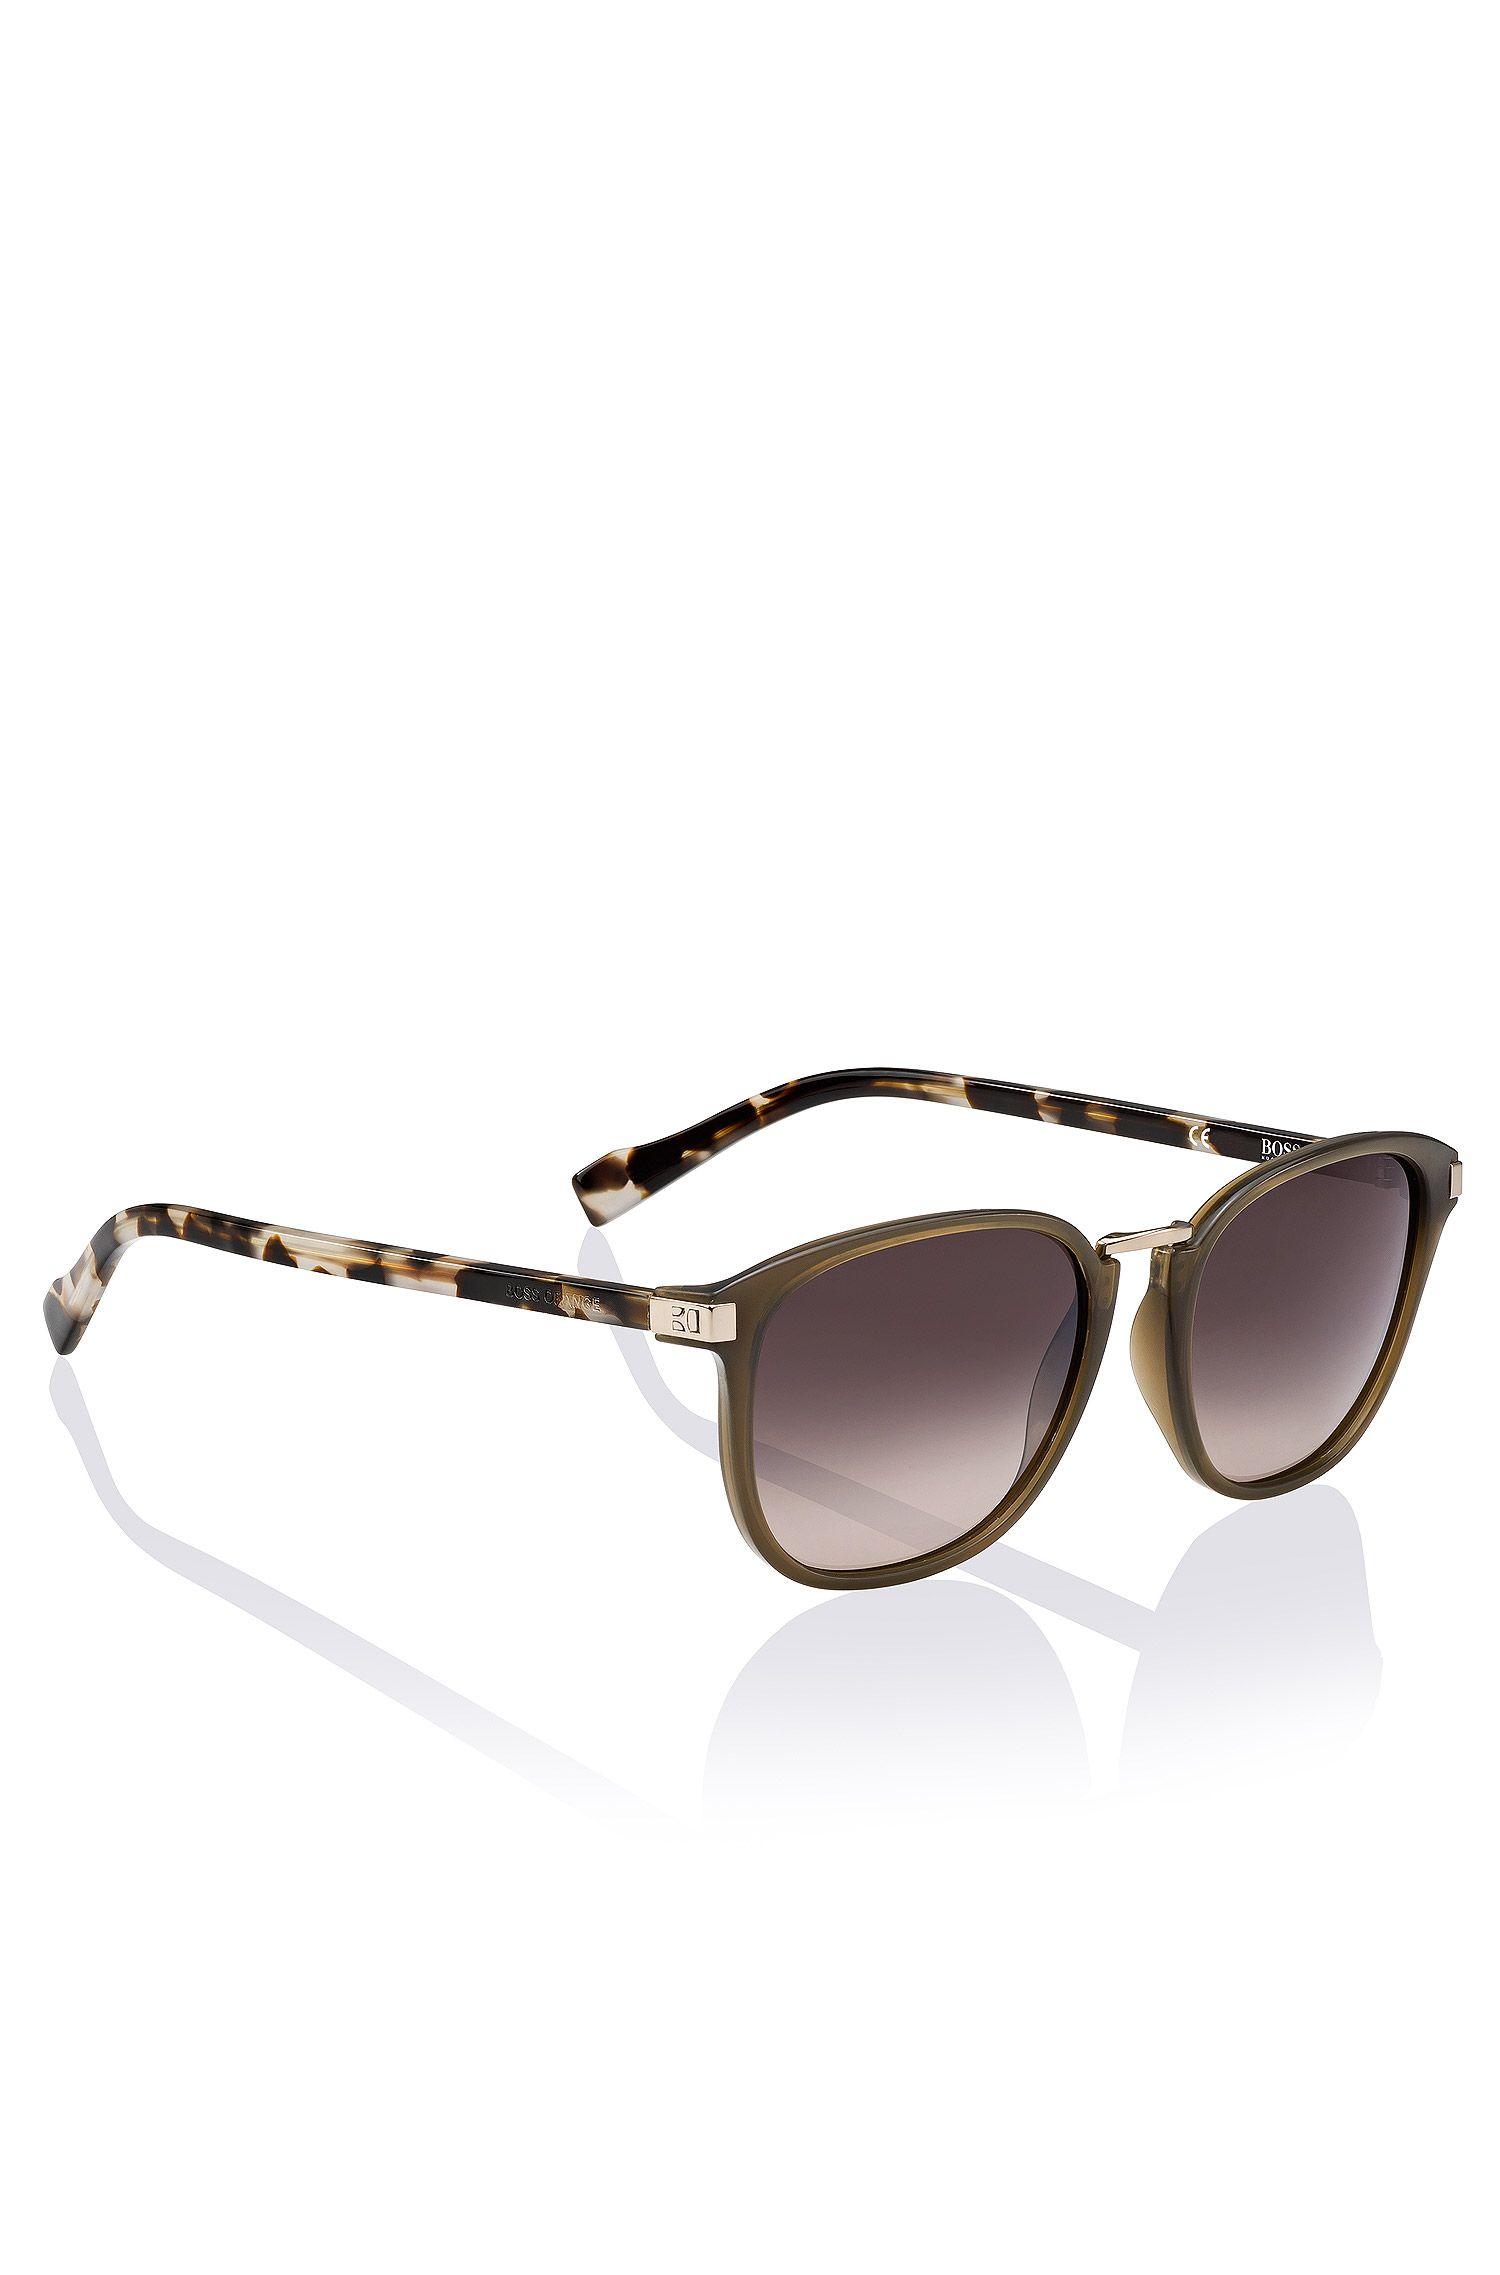 Vintage-zonnebril 'BO 0178/S' van acetaat